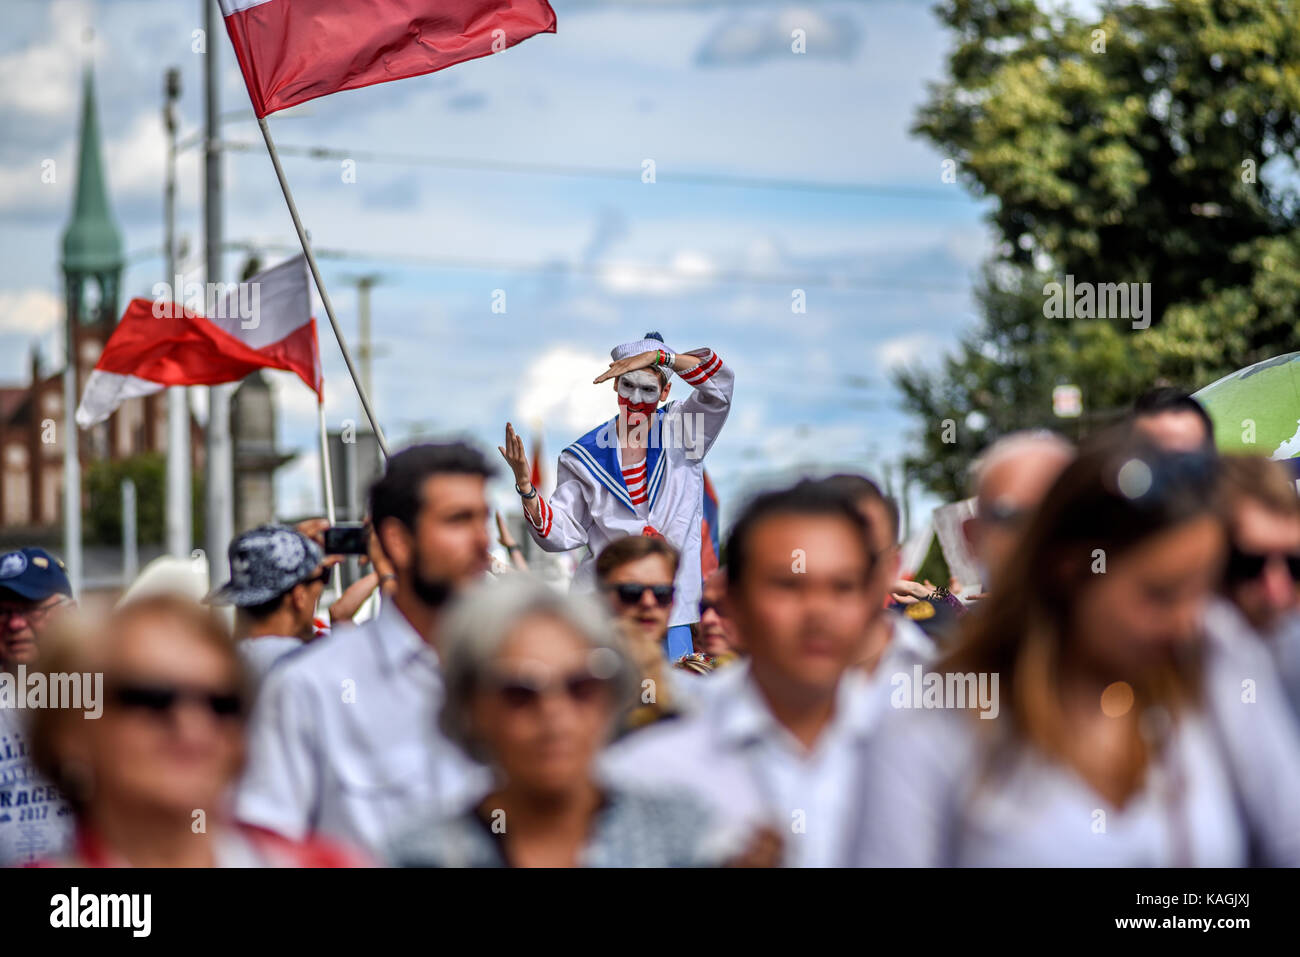 Szczecin, Poland, 6 august 2017: The Tall Ships Races 2017 crew parade in Szczecin. - Stock Image